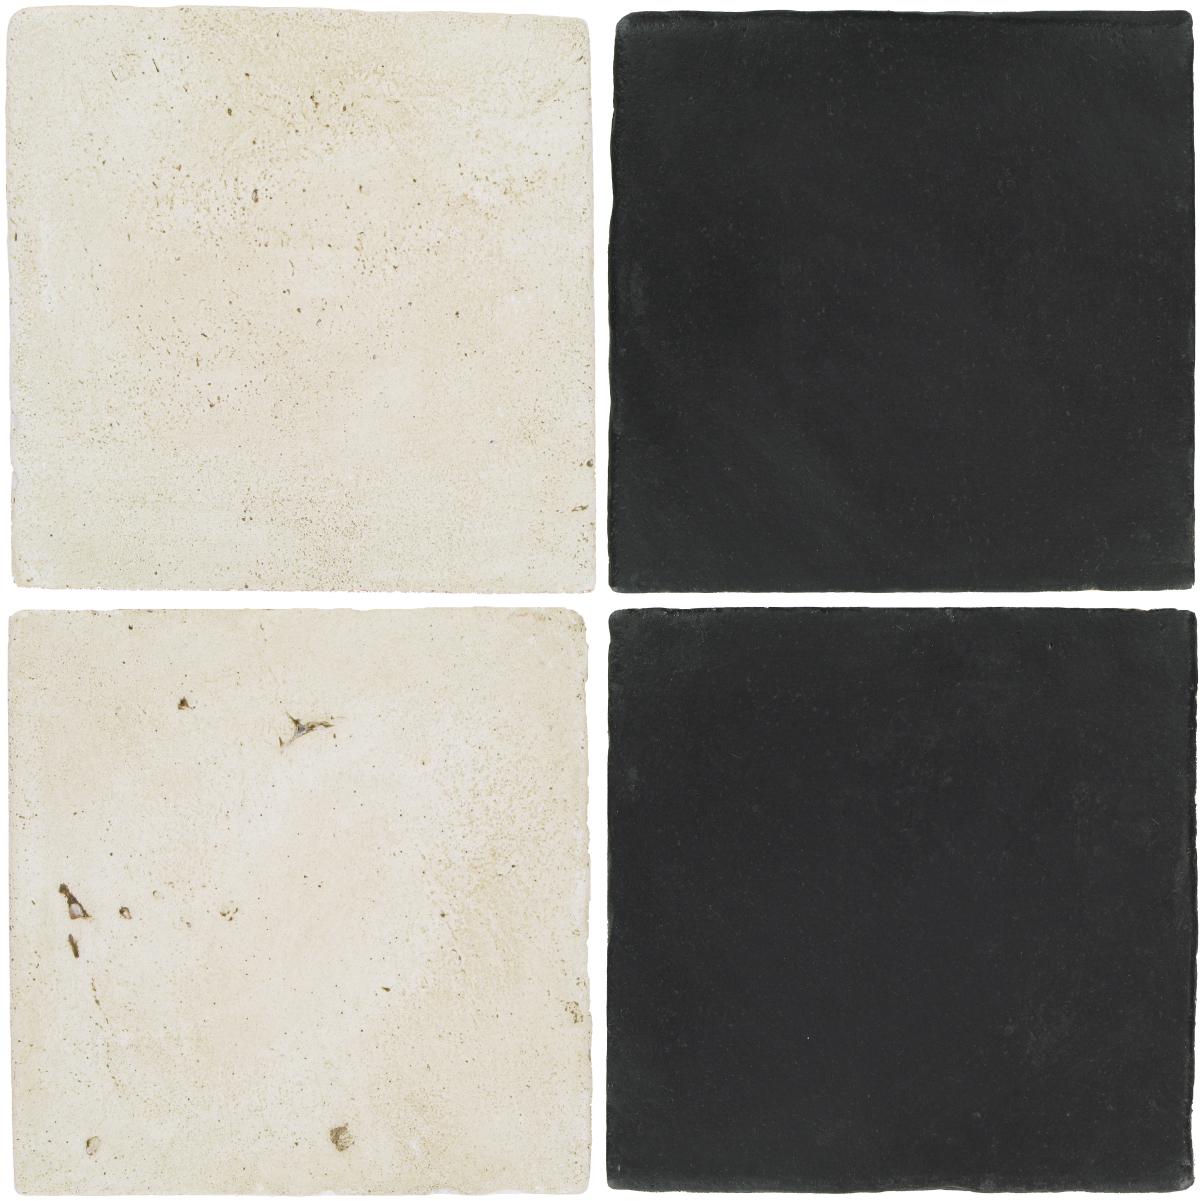 Pedralbes Antique Terracotta  2 Color Combinations  VTG-PGAW Antique White + OHS-PGCB Carbon Black